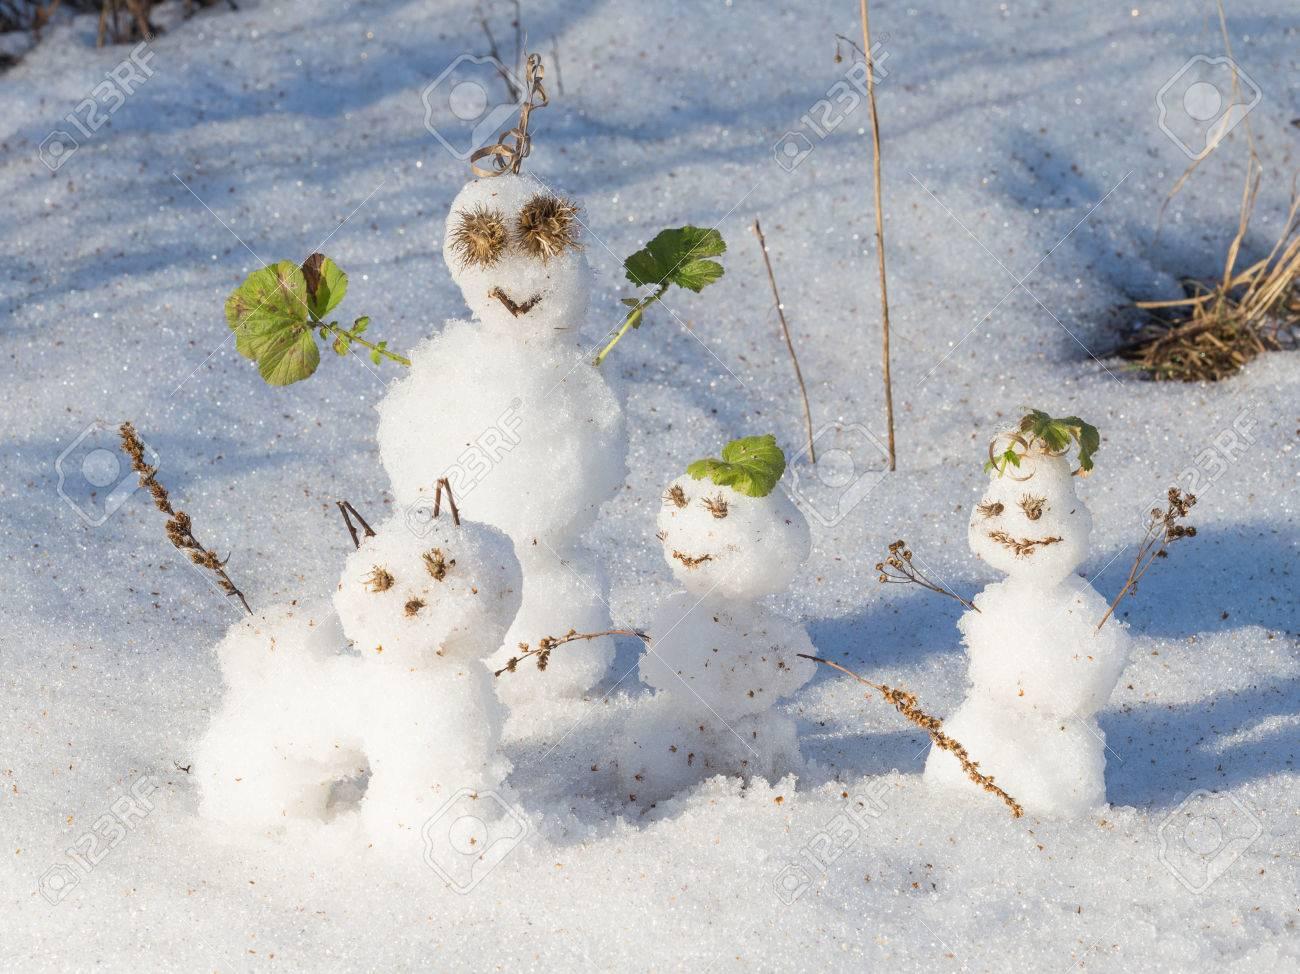 Schnee Lustige Bilder.Schnee Lustige Bilder Weihnachten 2019